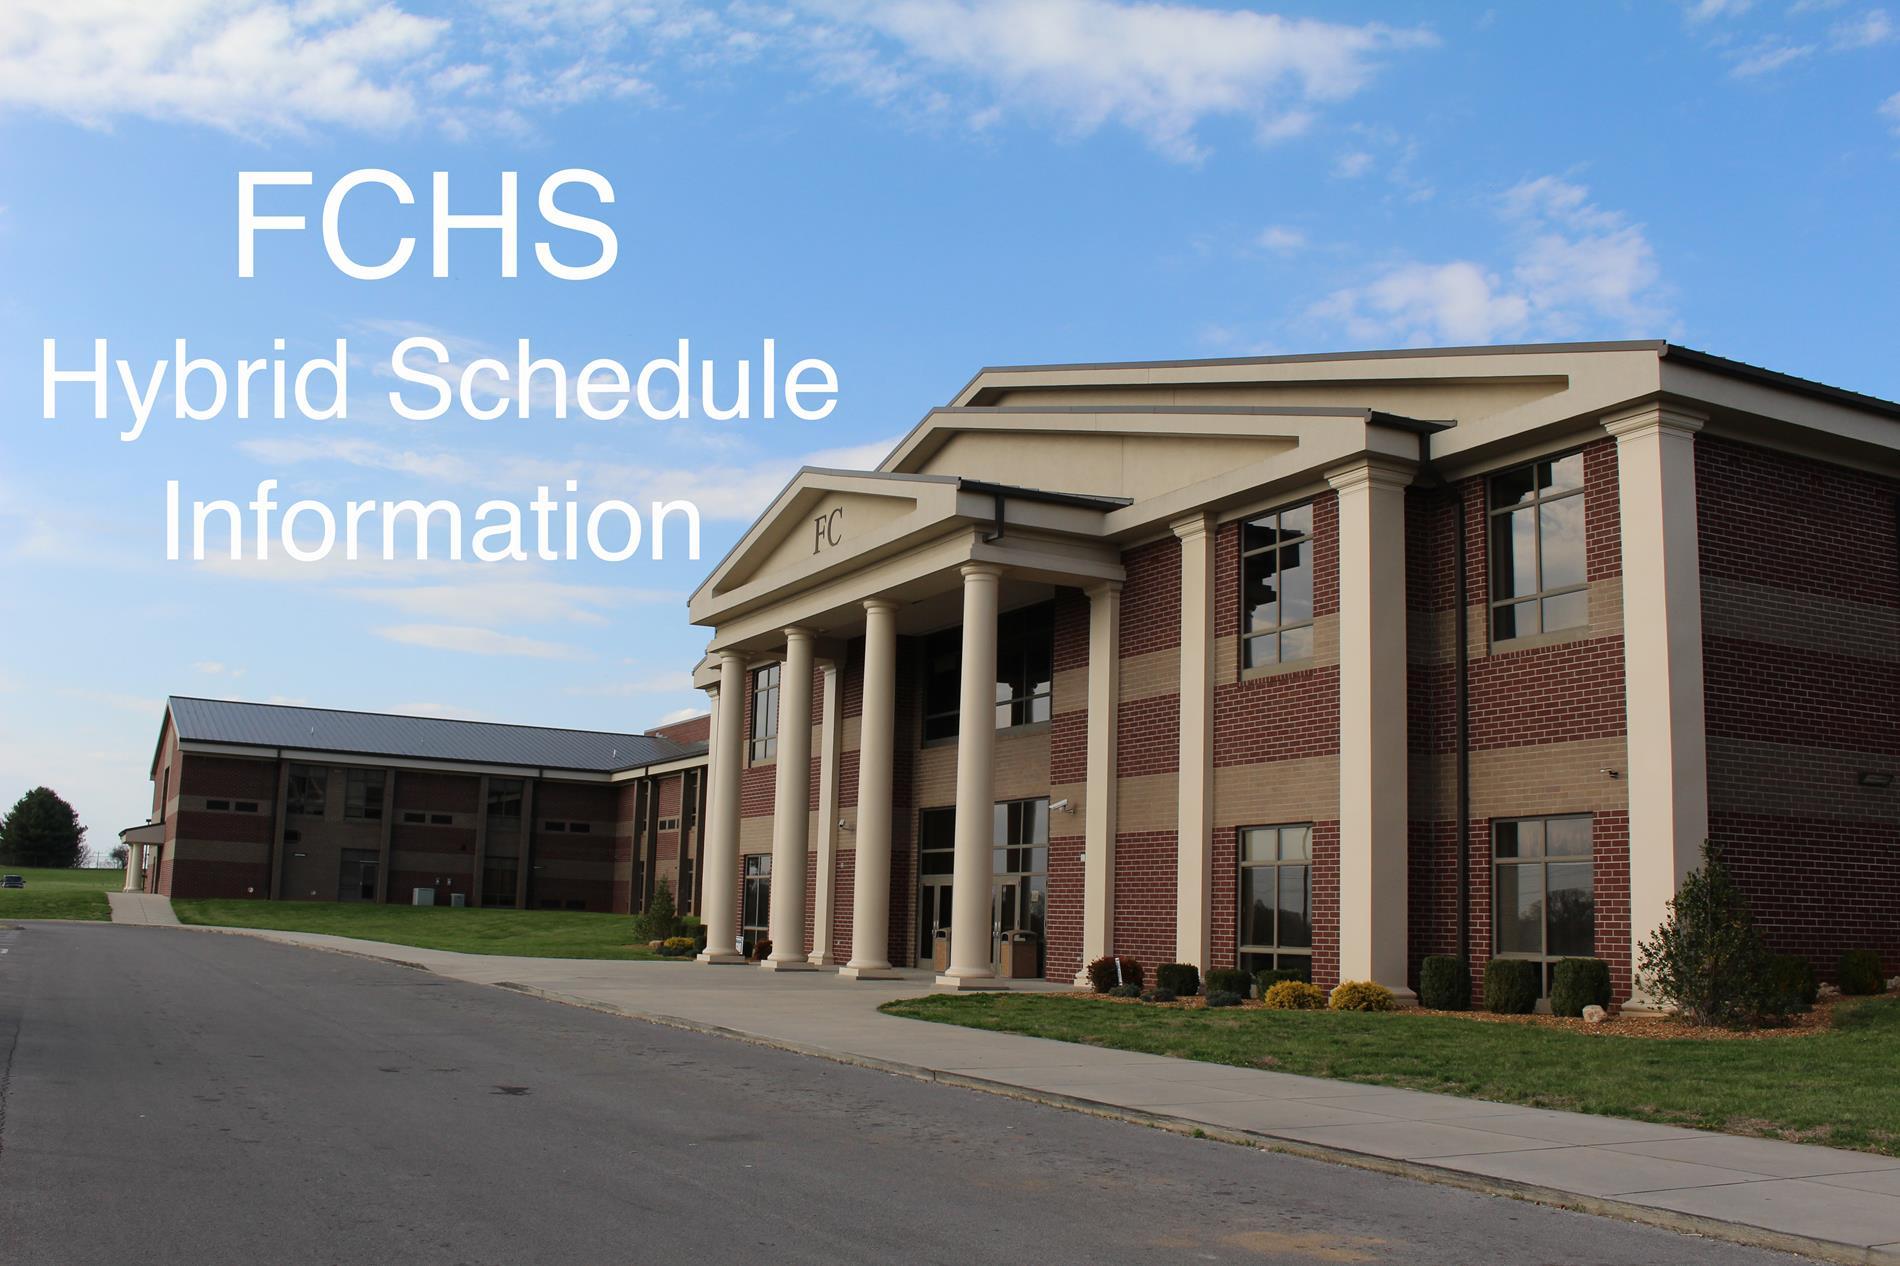 Feb. hybrid schedule